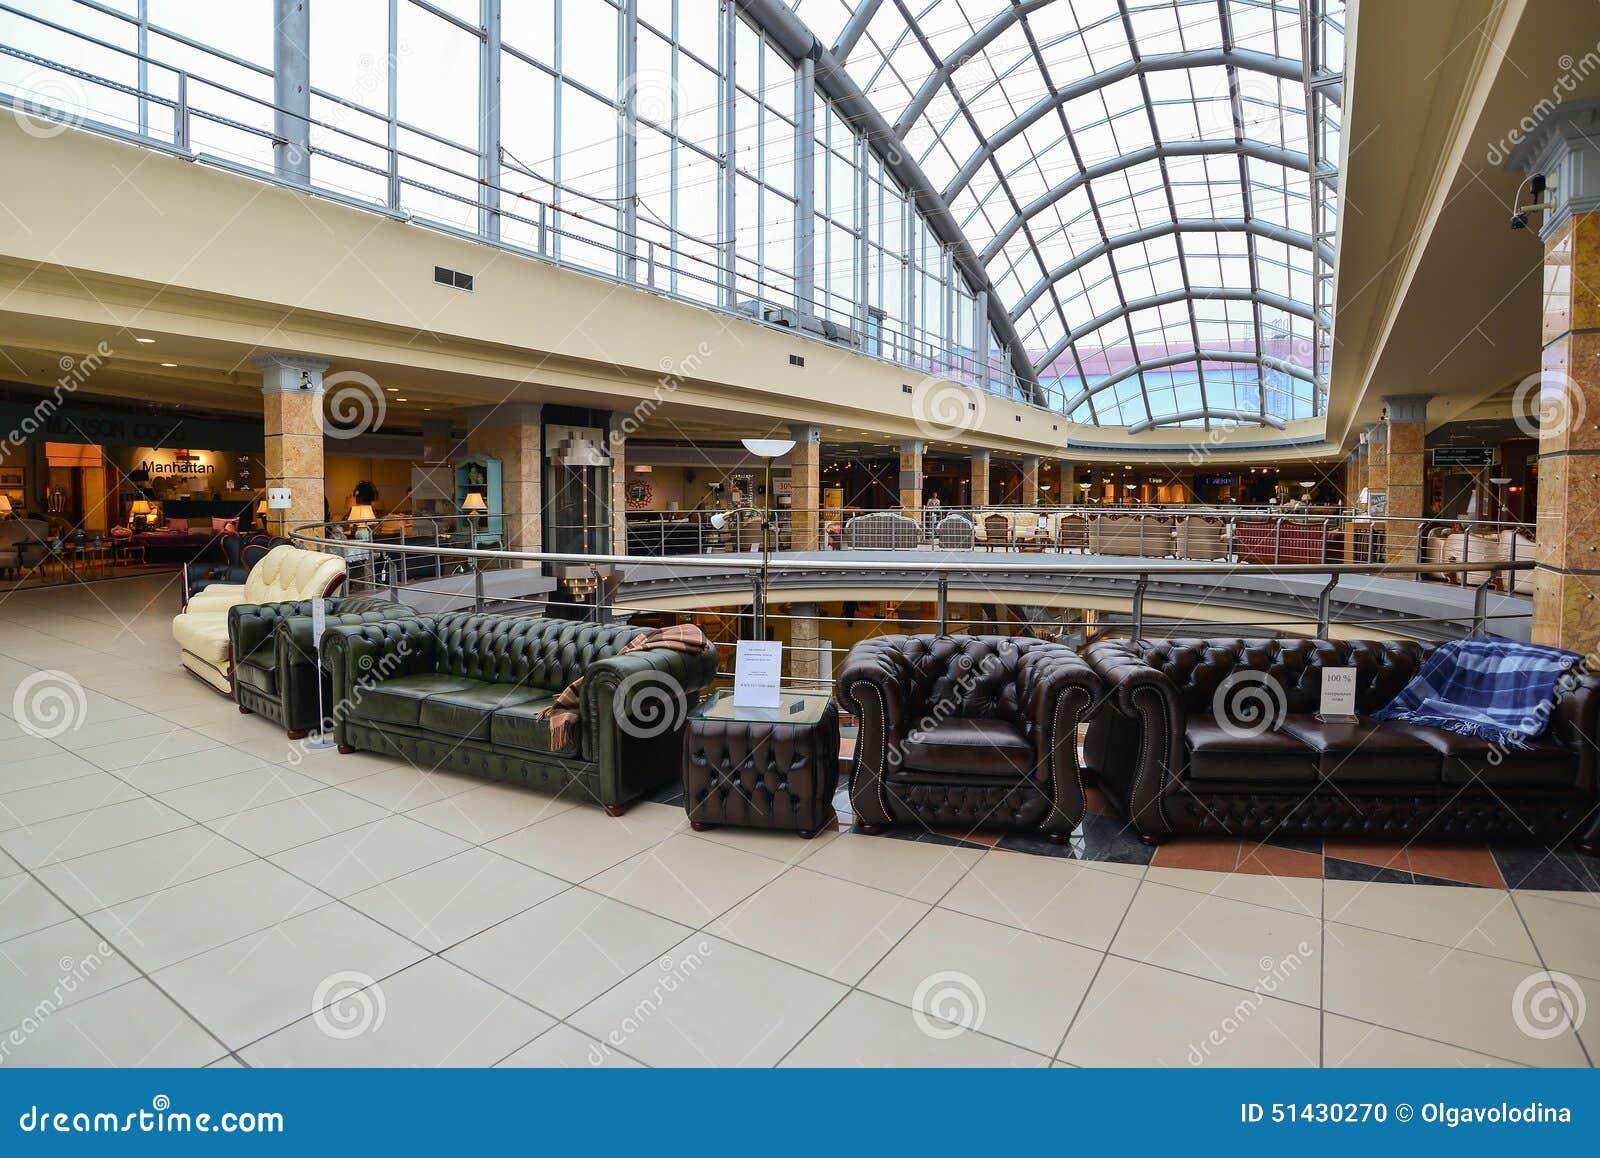 Interior Furniture Shopping Complex Grand. Furniture Shopping Mall GRAND    Largest Specialty Shop Editorial Image